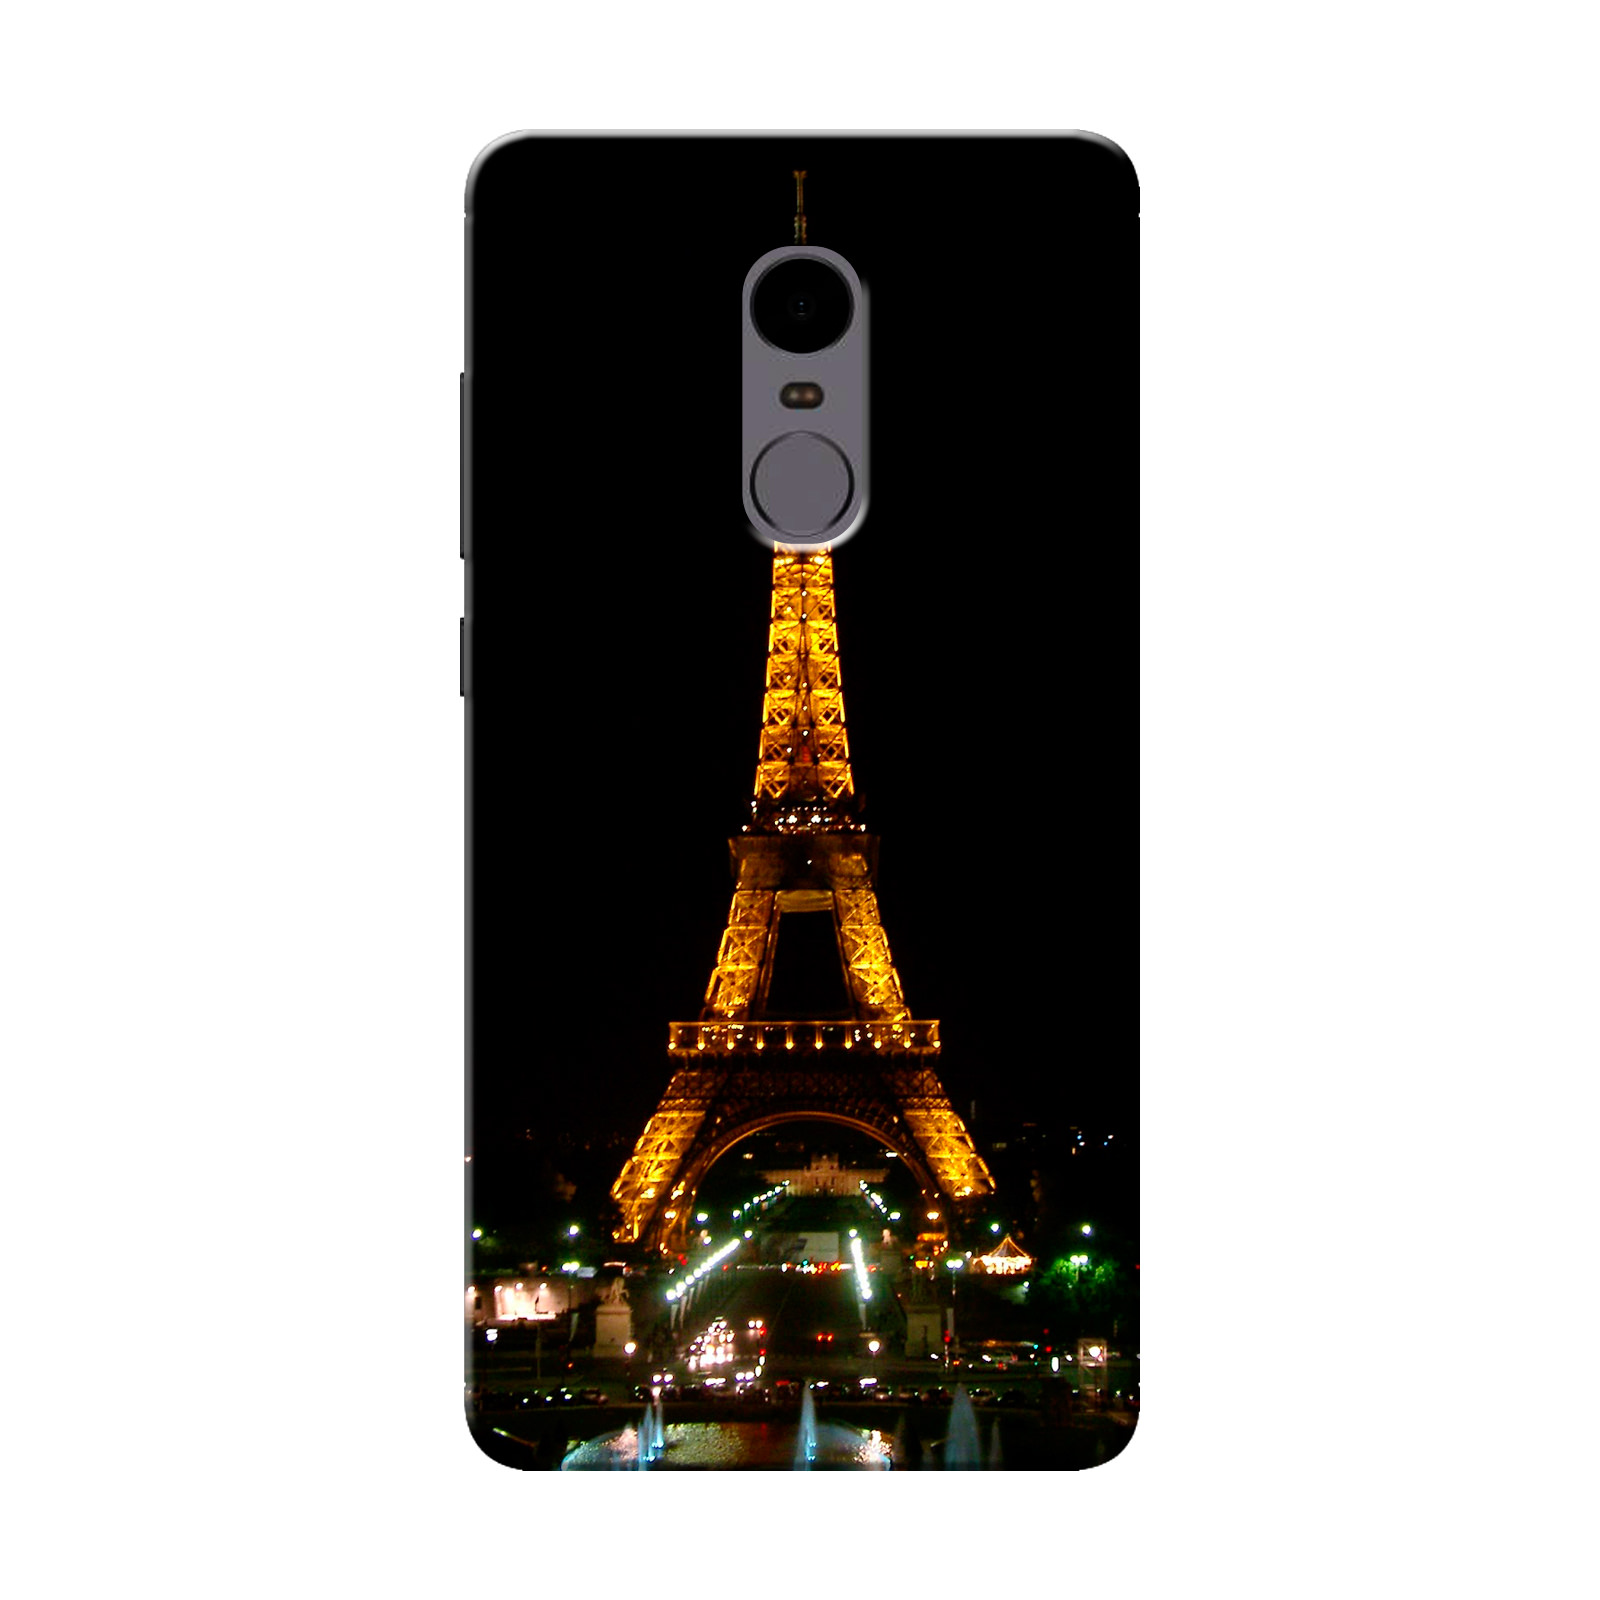 sairafashions Wild Thunder Mi Redmi Note 4 Mobile Back Cover Case And Designer Printed Hard Flexible Mobile Case Cover  - 1117